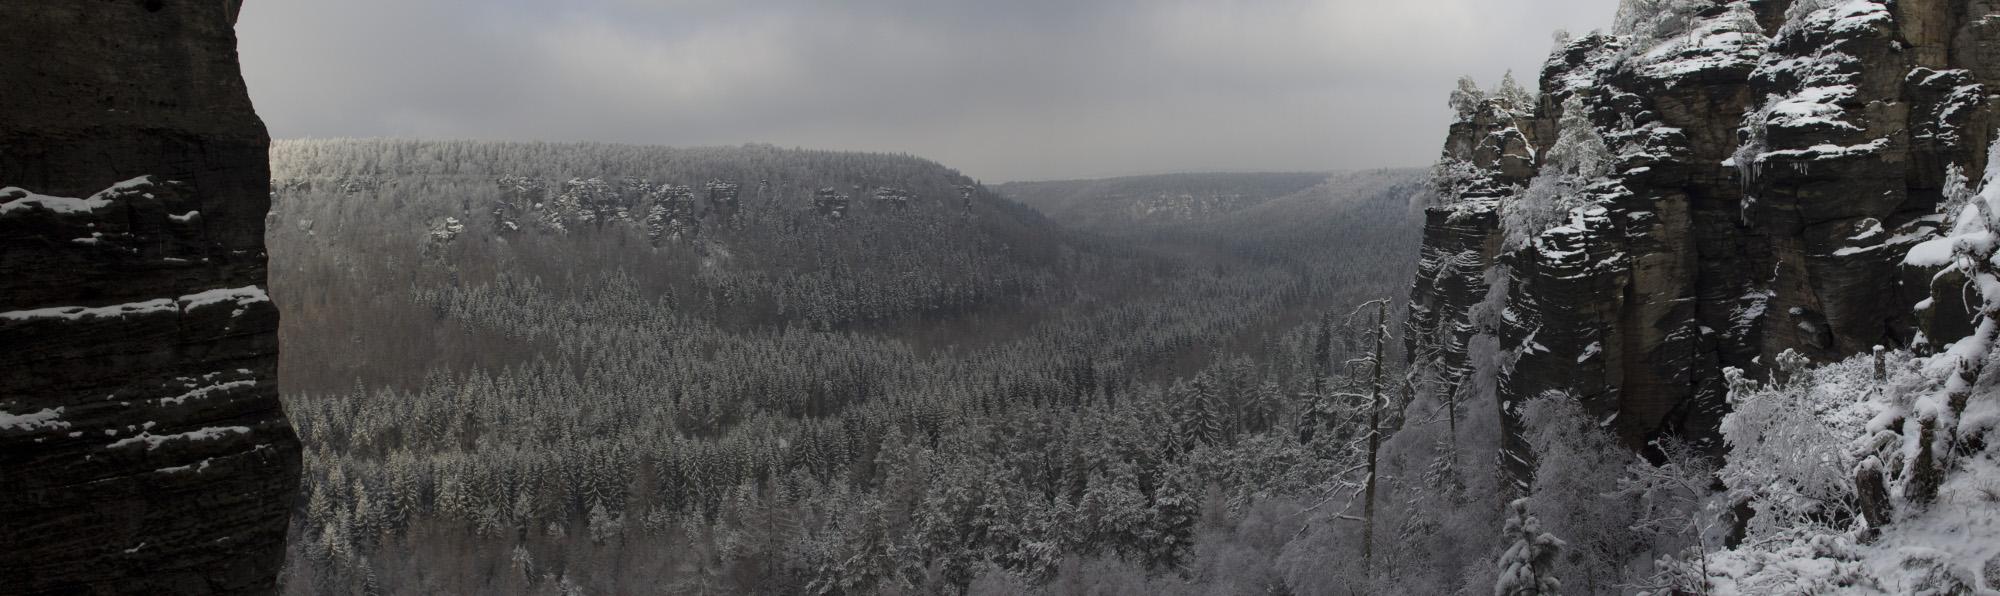 Bielatal im Winter